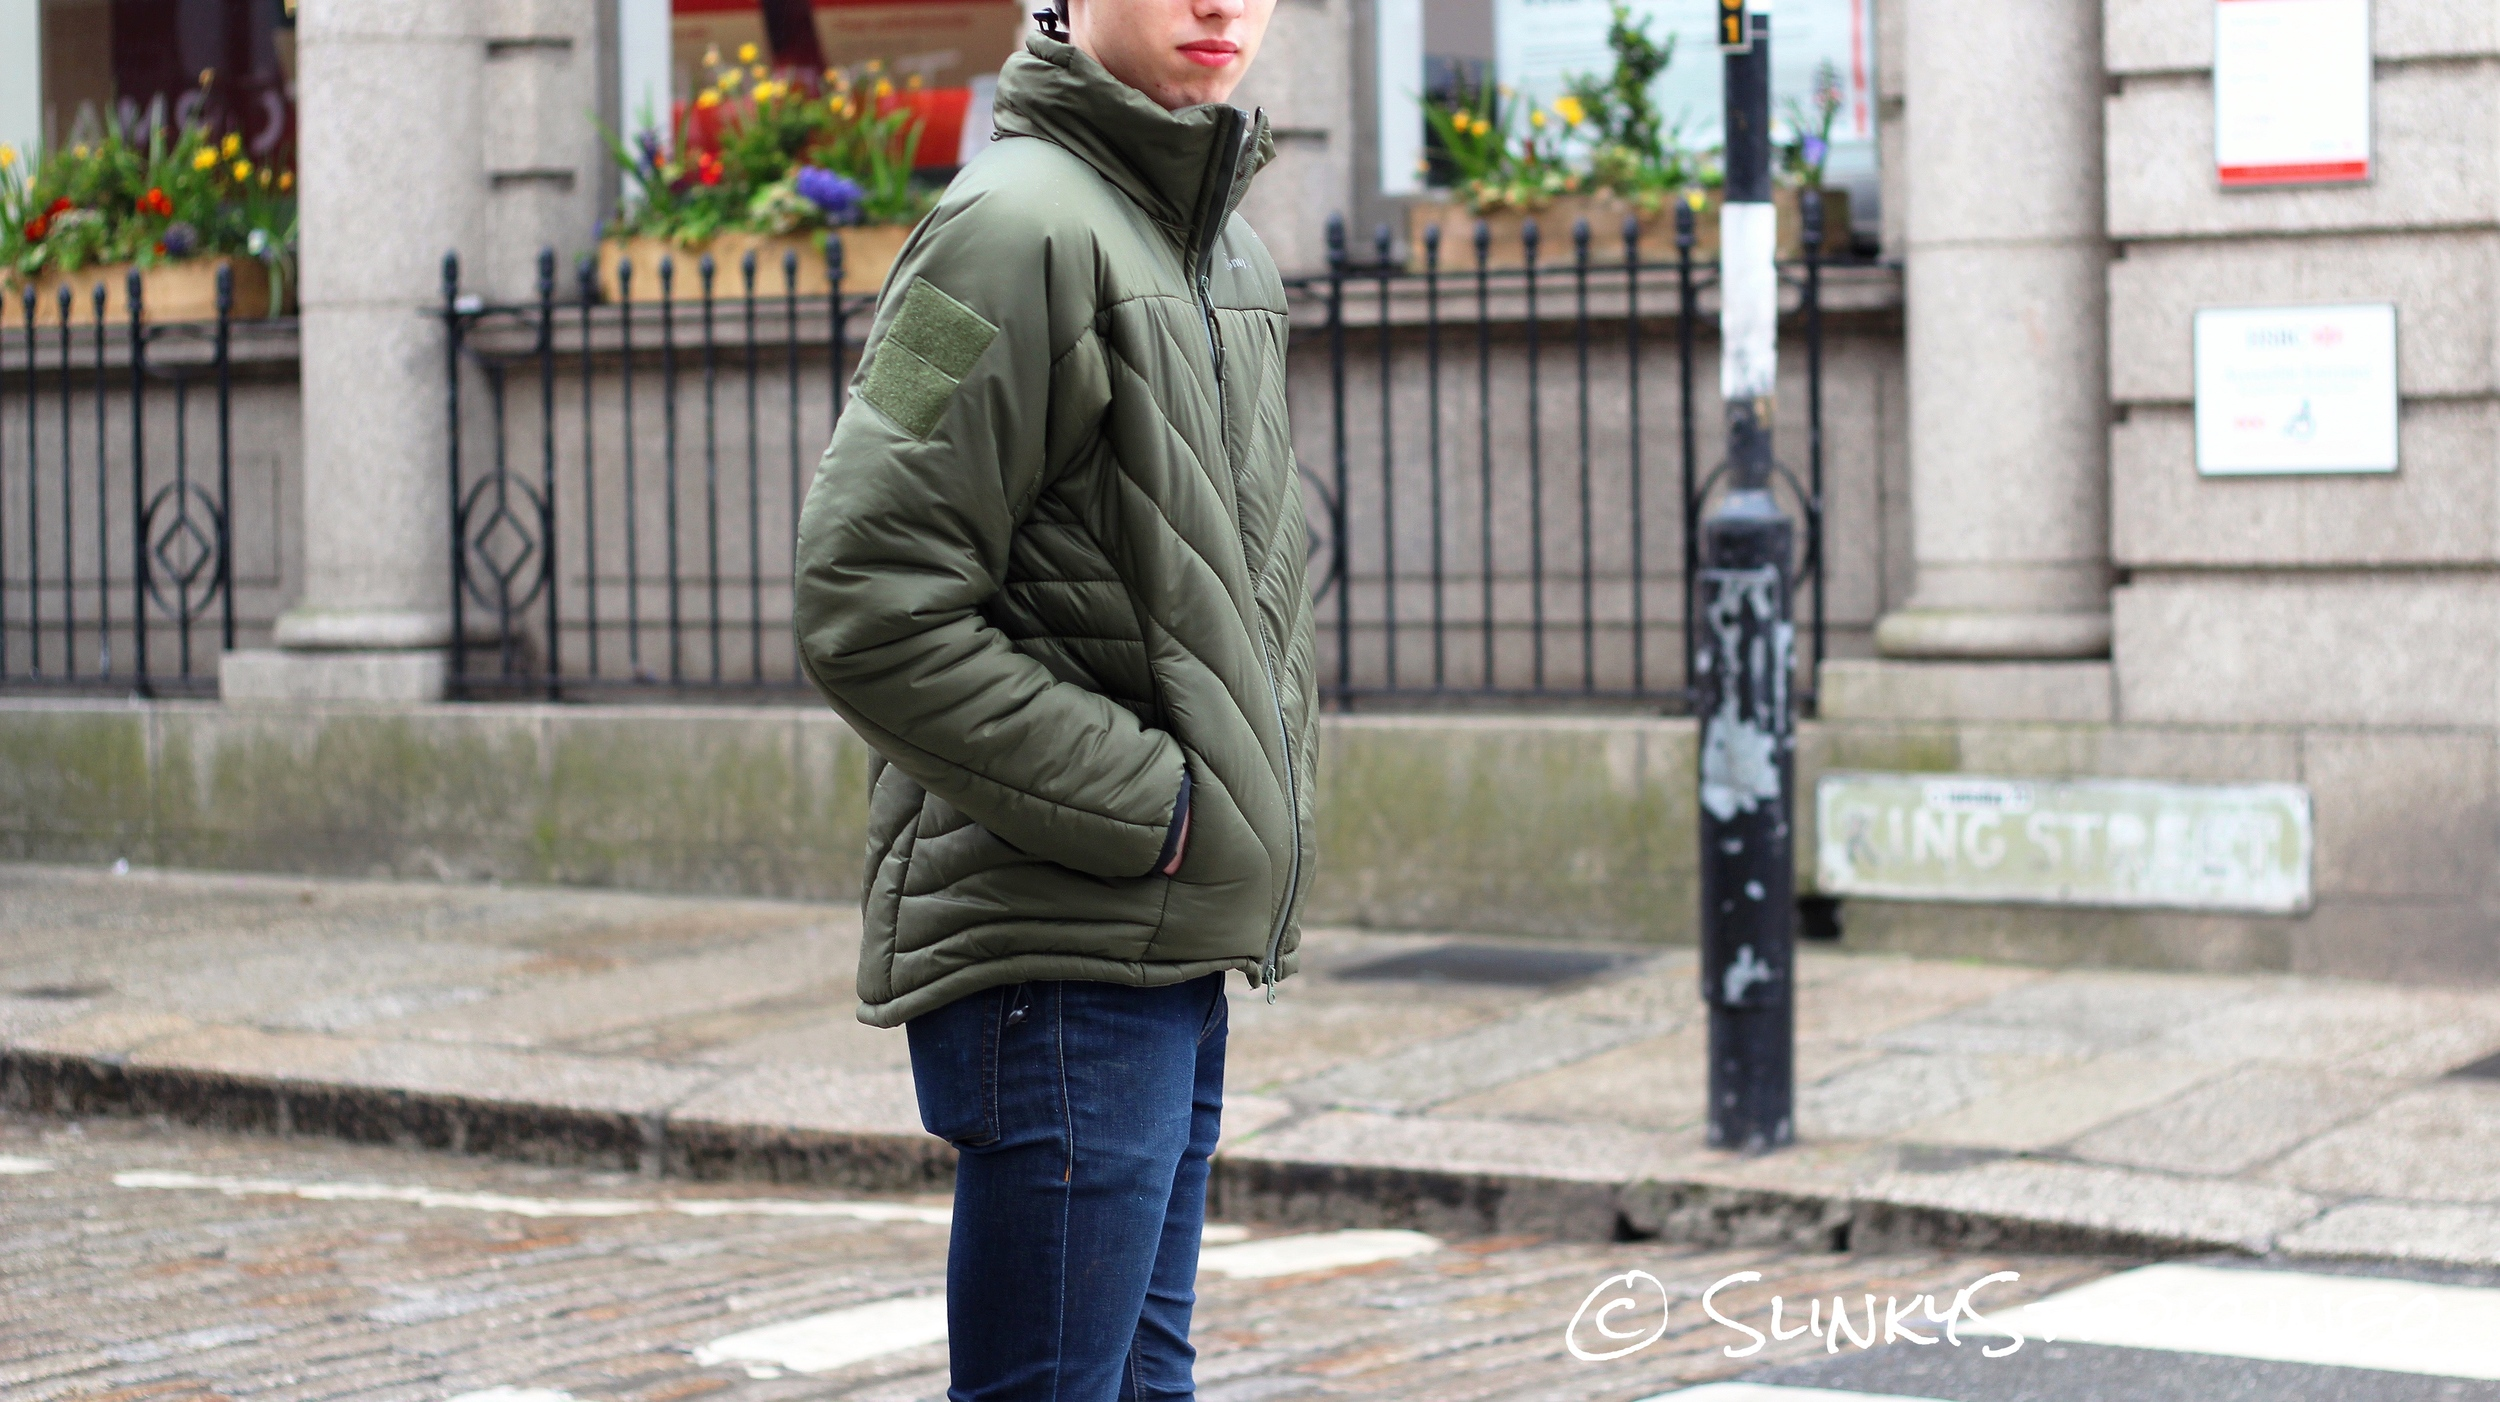 Snugpak SJ6 Jacket Walking Truro Cornwal .jpg